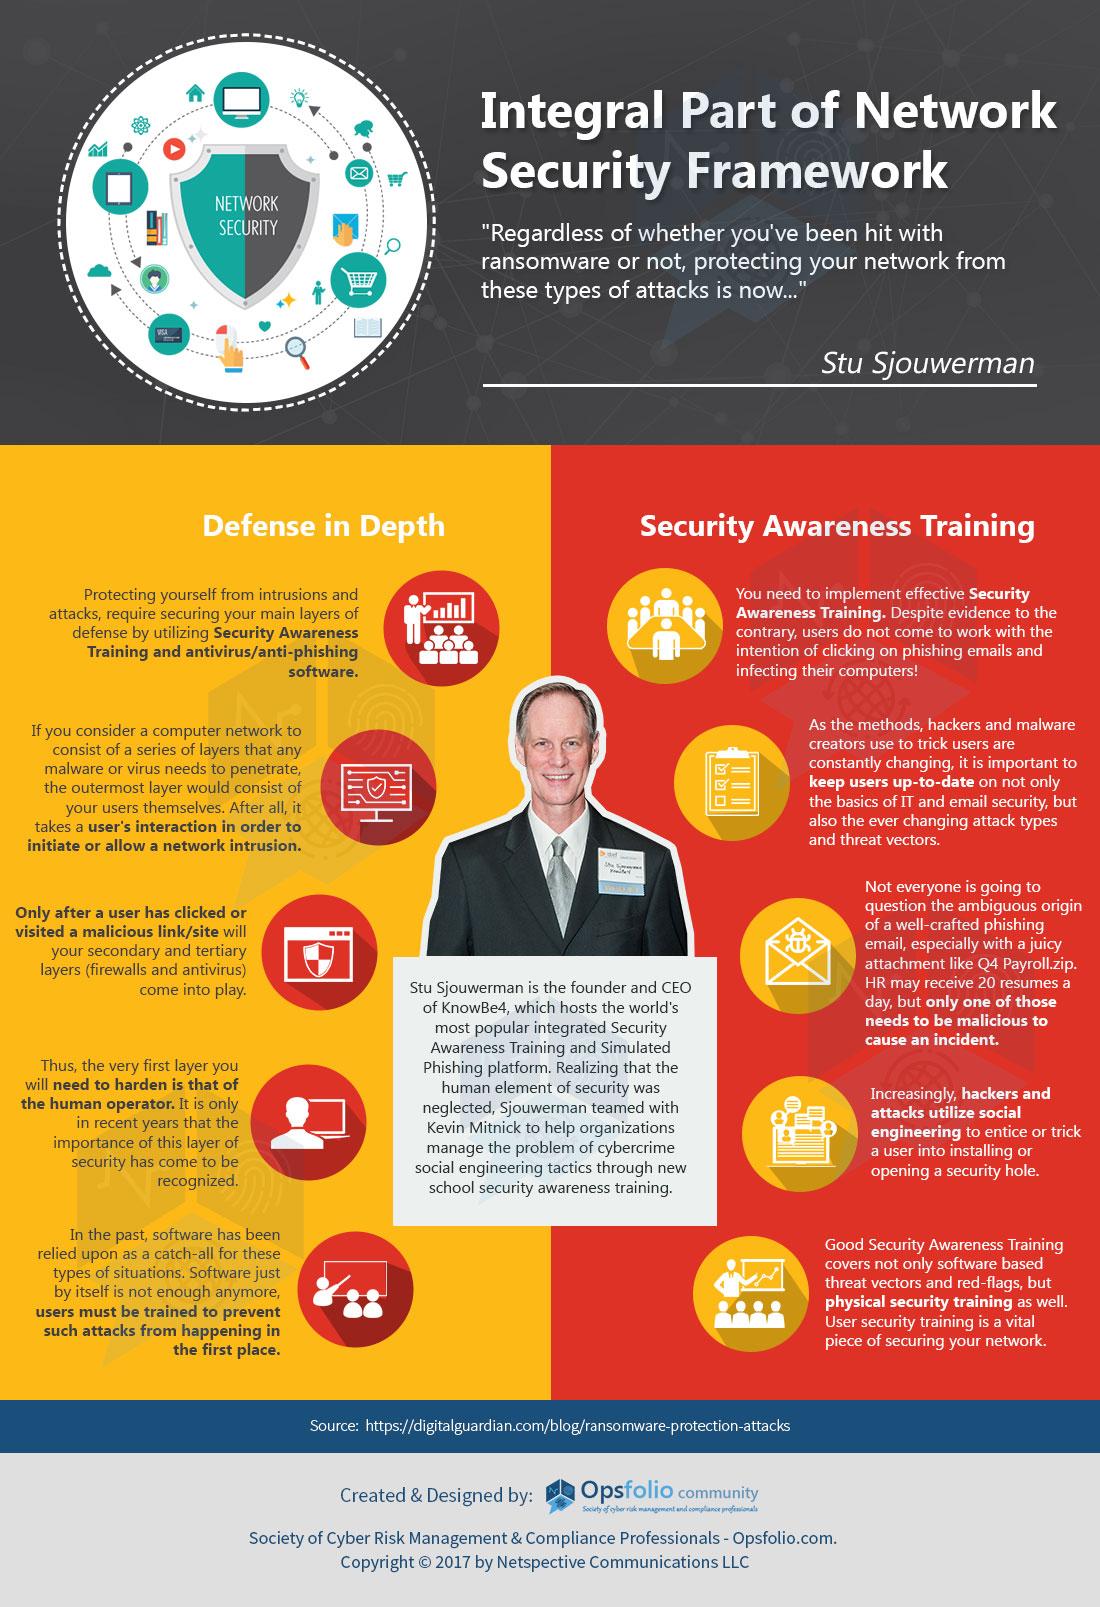 Network Security Framework